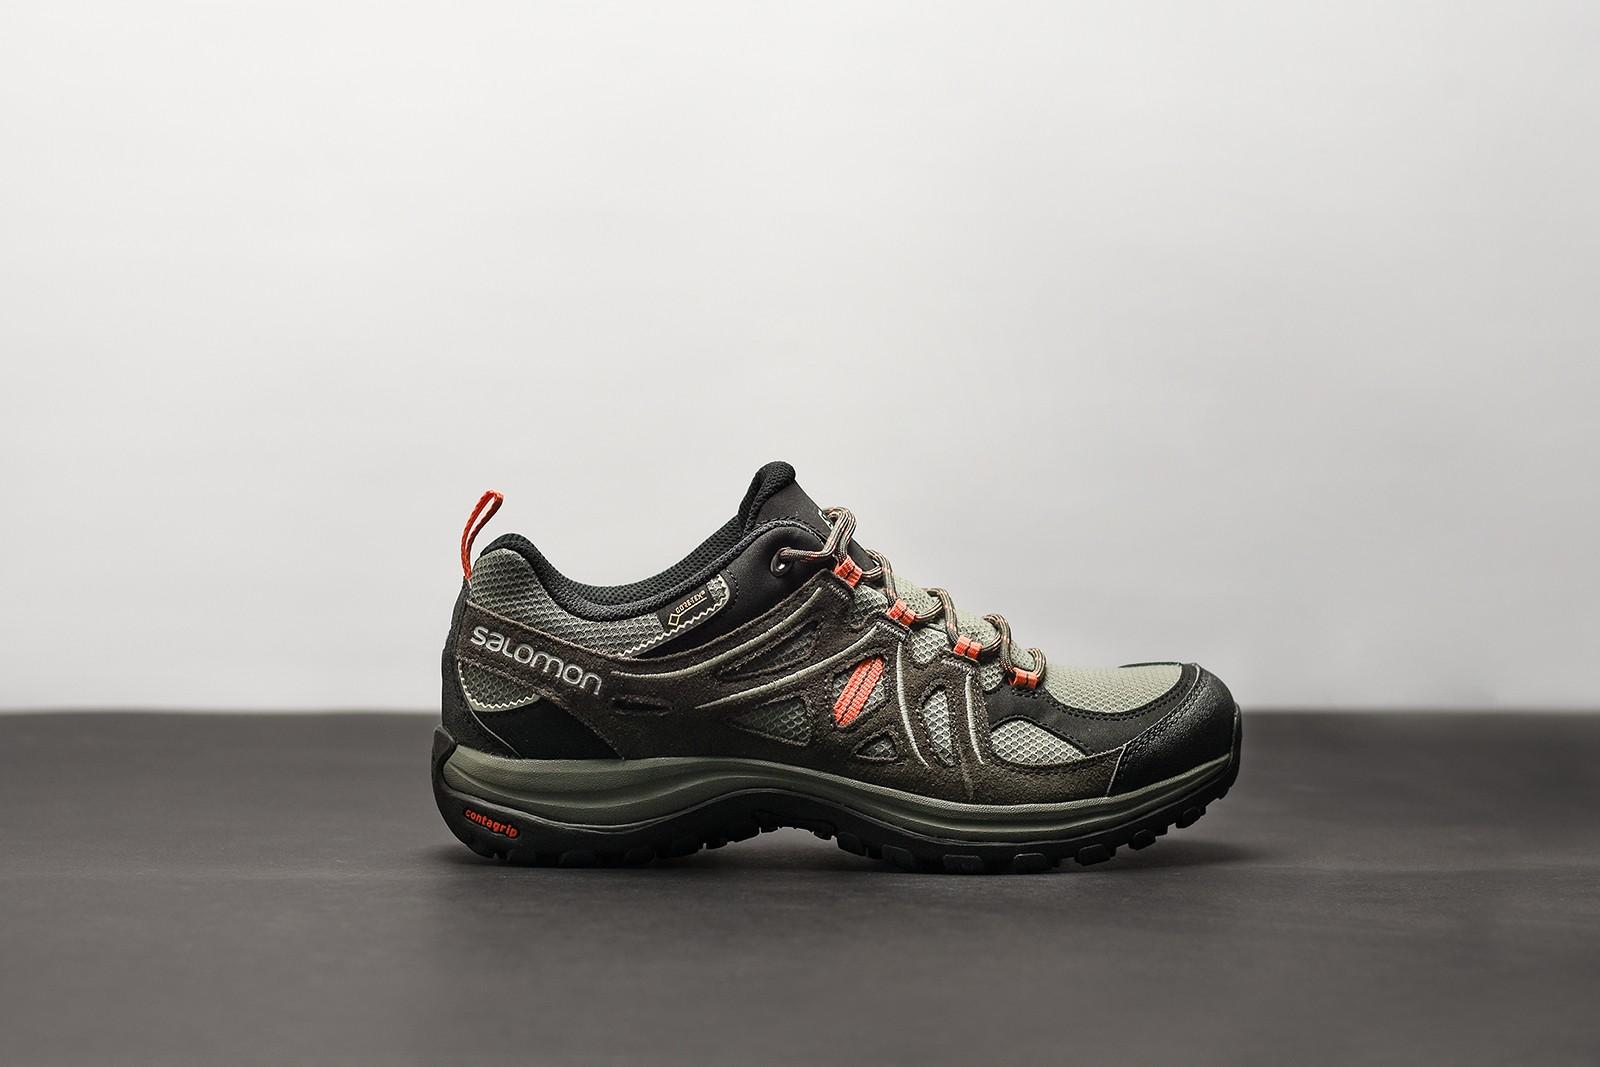 8fda8223eb9f Dámská Treková obuv Salomon ELLIPSE 2 GTXR W Castor Gra Be